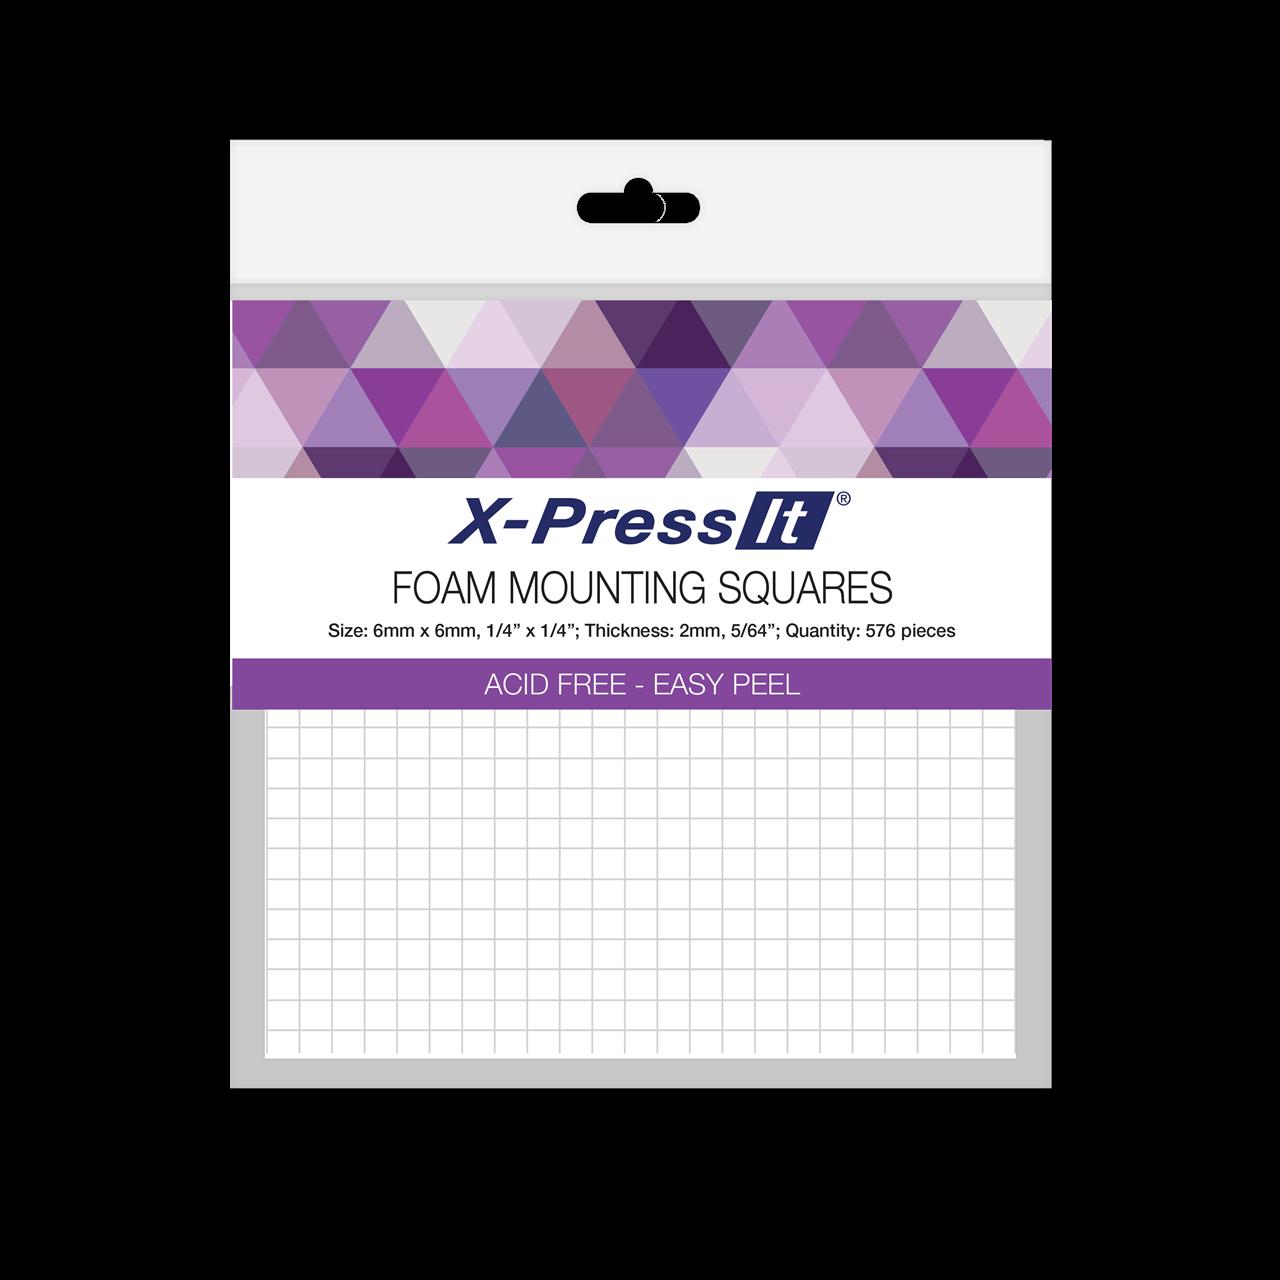 0017406_x-press-it-foam-mounting-squares-6x6mm-576pcs